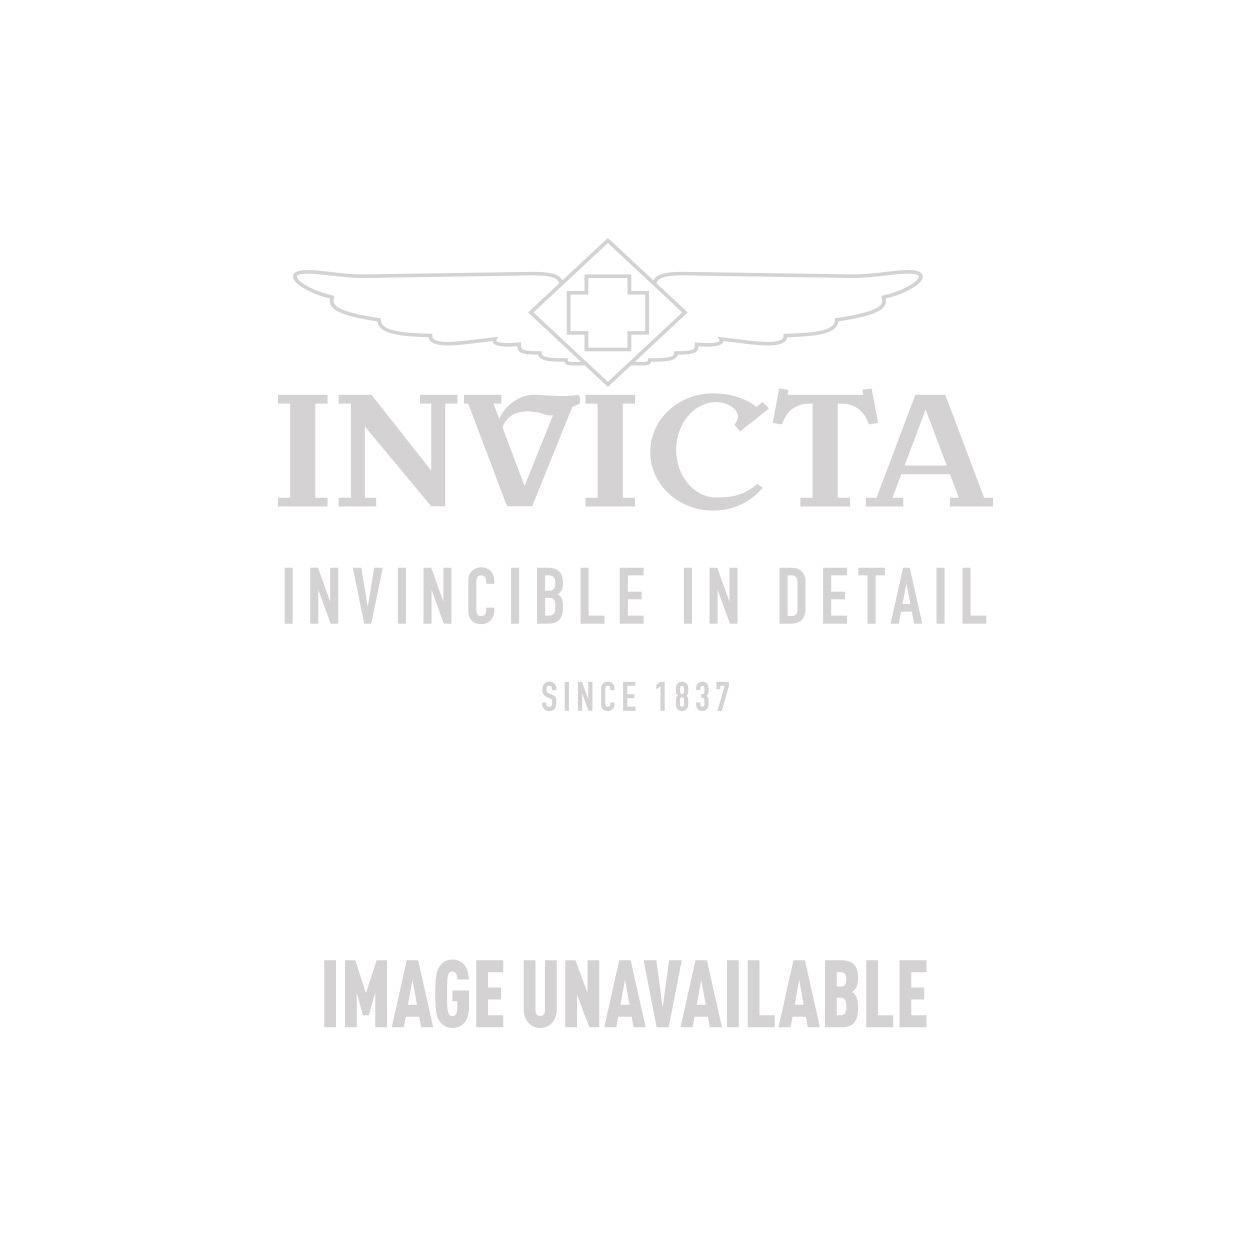 Invicta Speedway Quartz Watch - Stainless Steel case Stainless Steel band - Model 18389